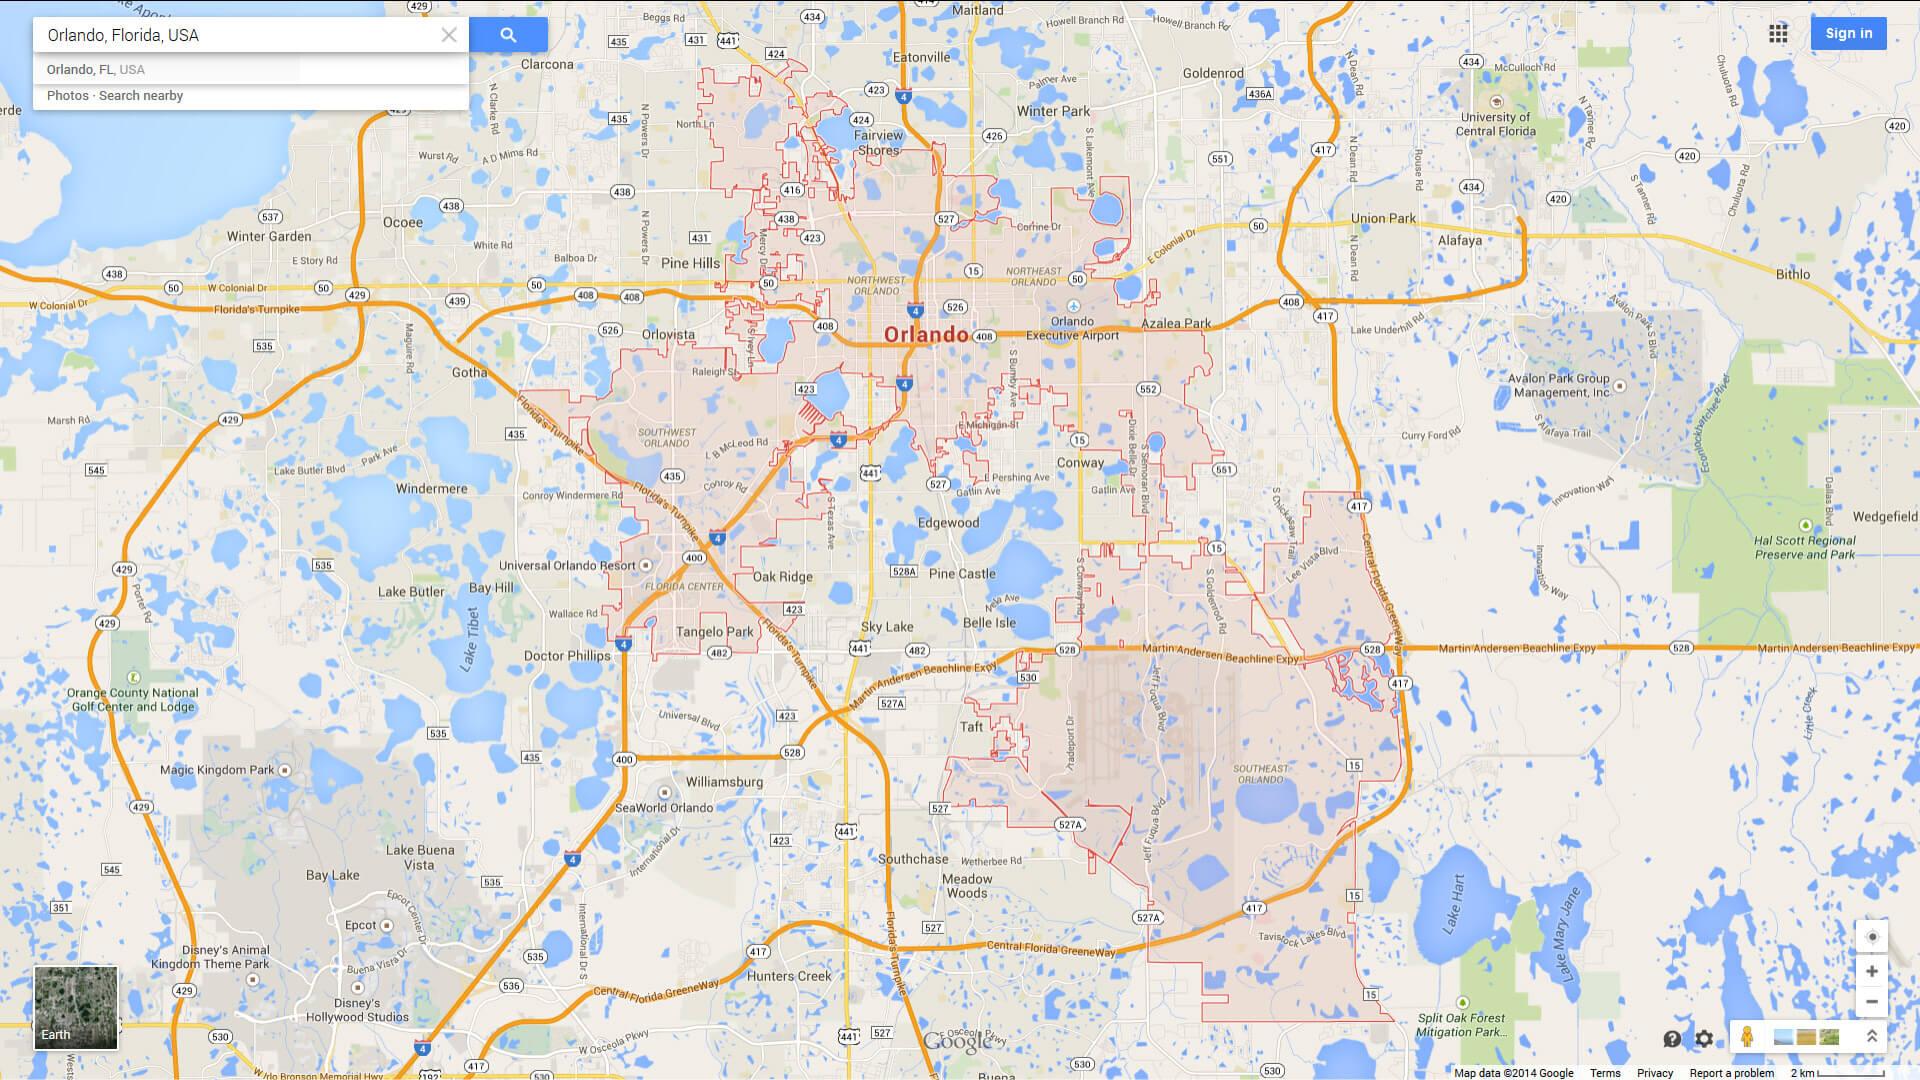 Orlando, Florida Map - Detailed Map Of Orlando Florida